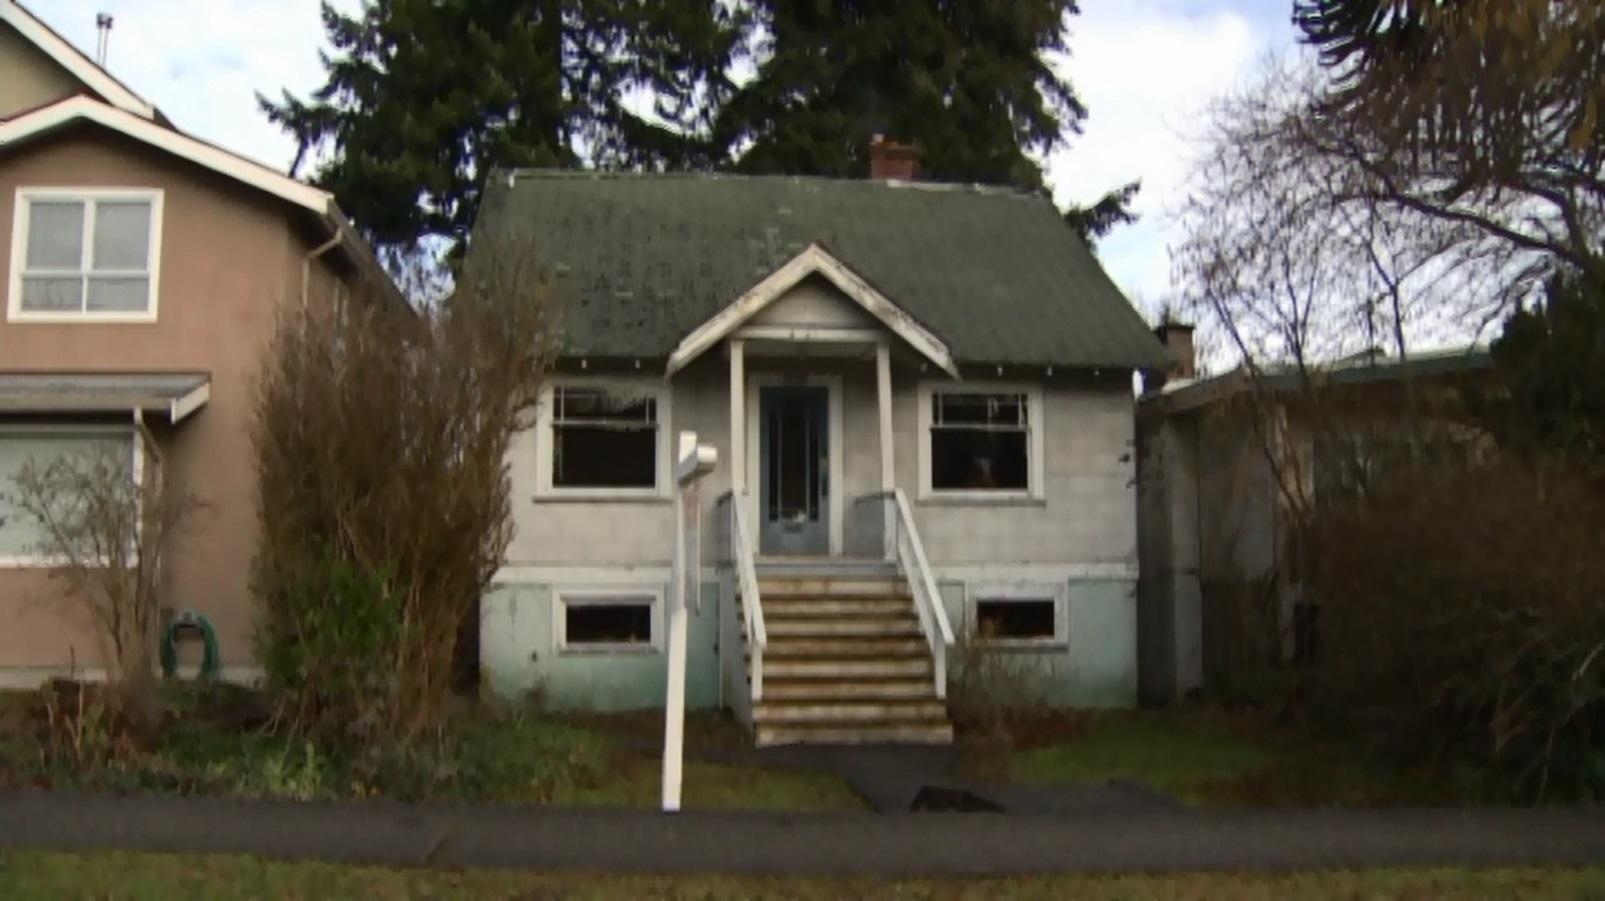 vancouver million dollar home cnn_143482